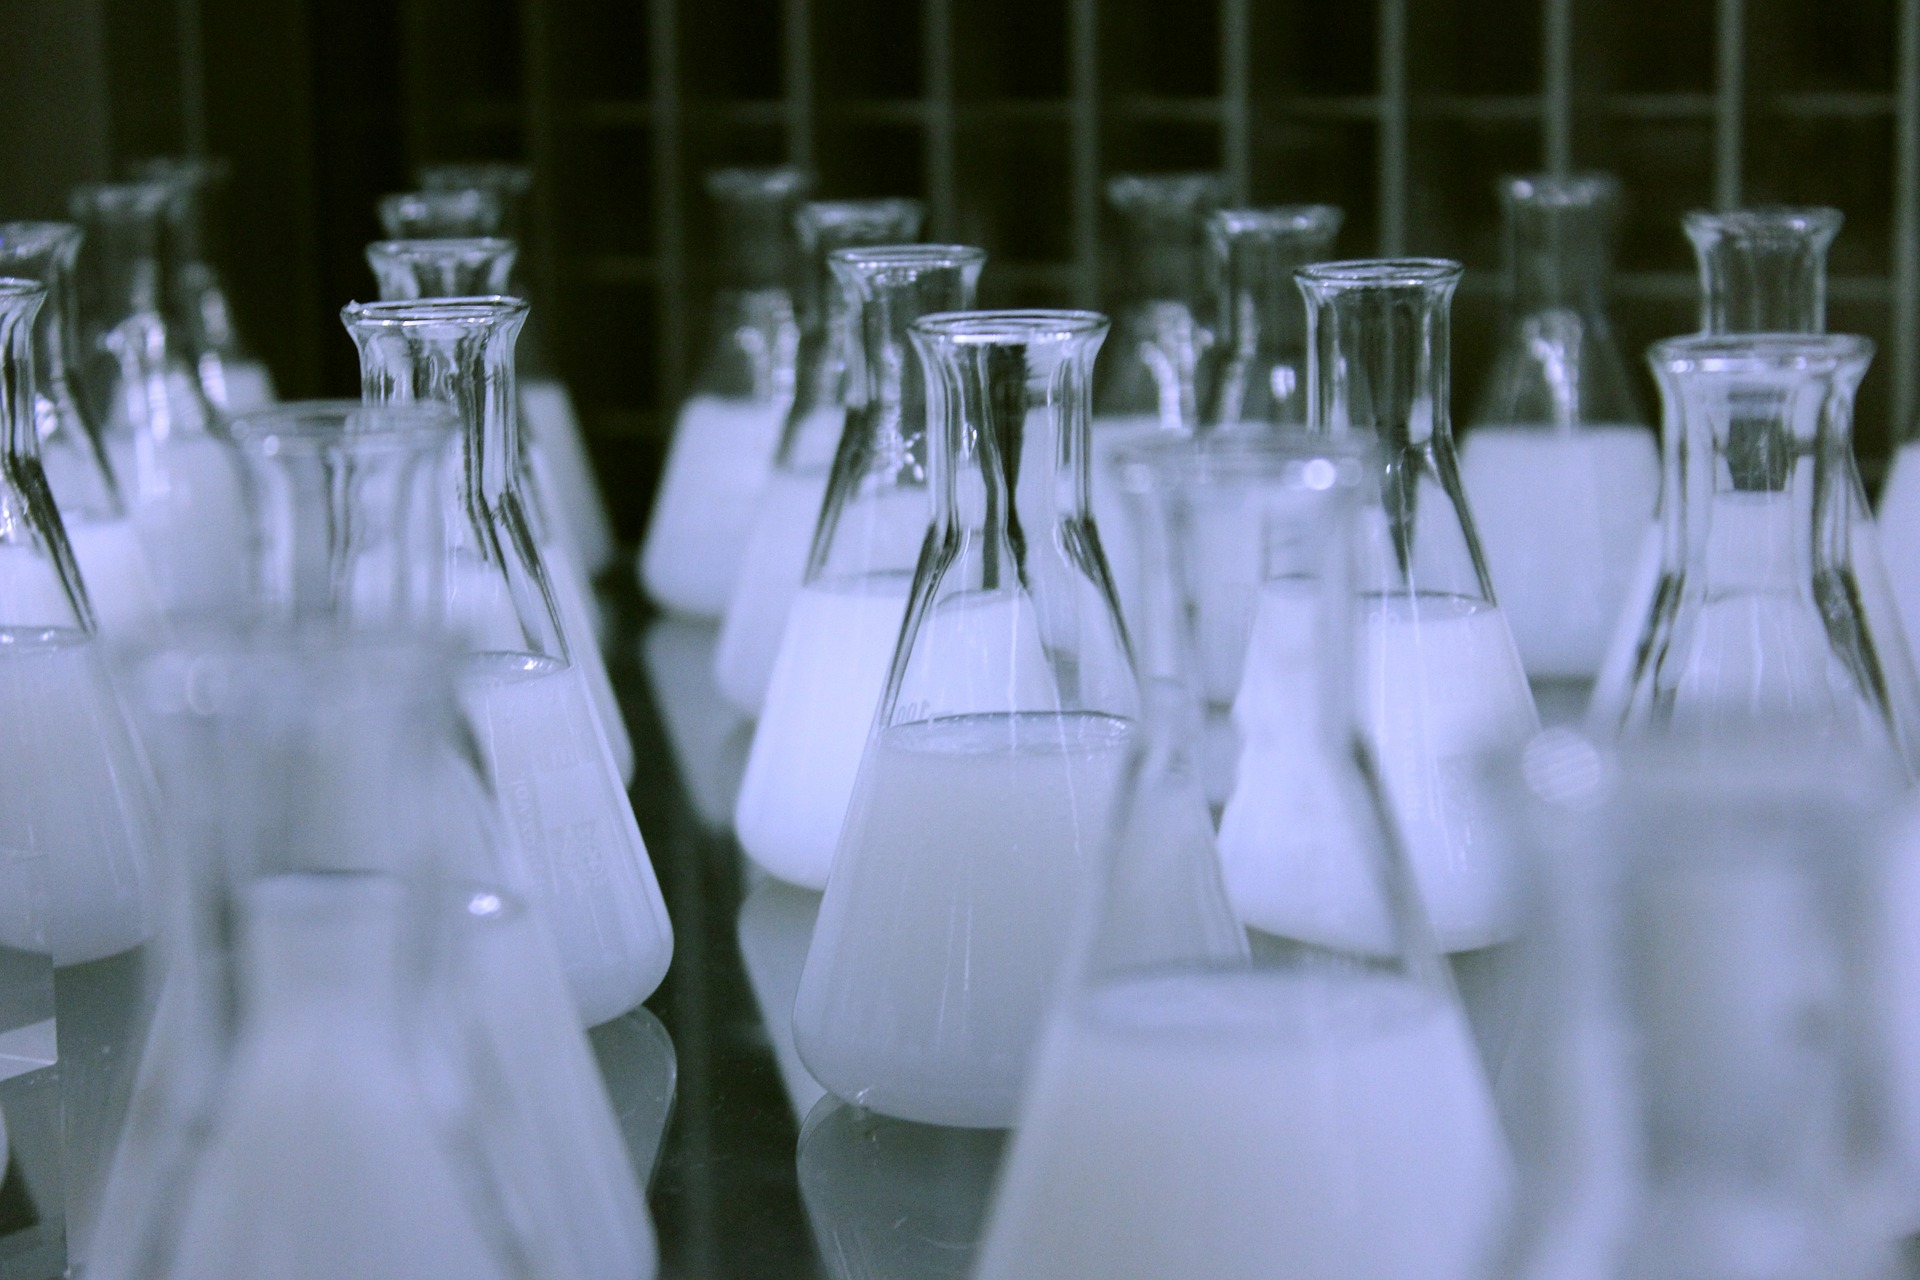 flasks-606612_1920.jpg